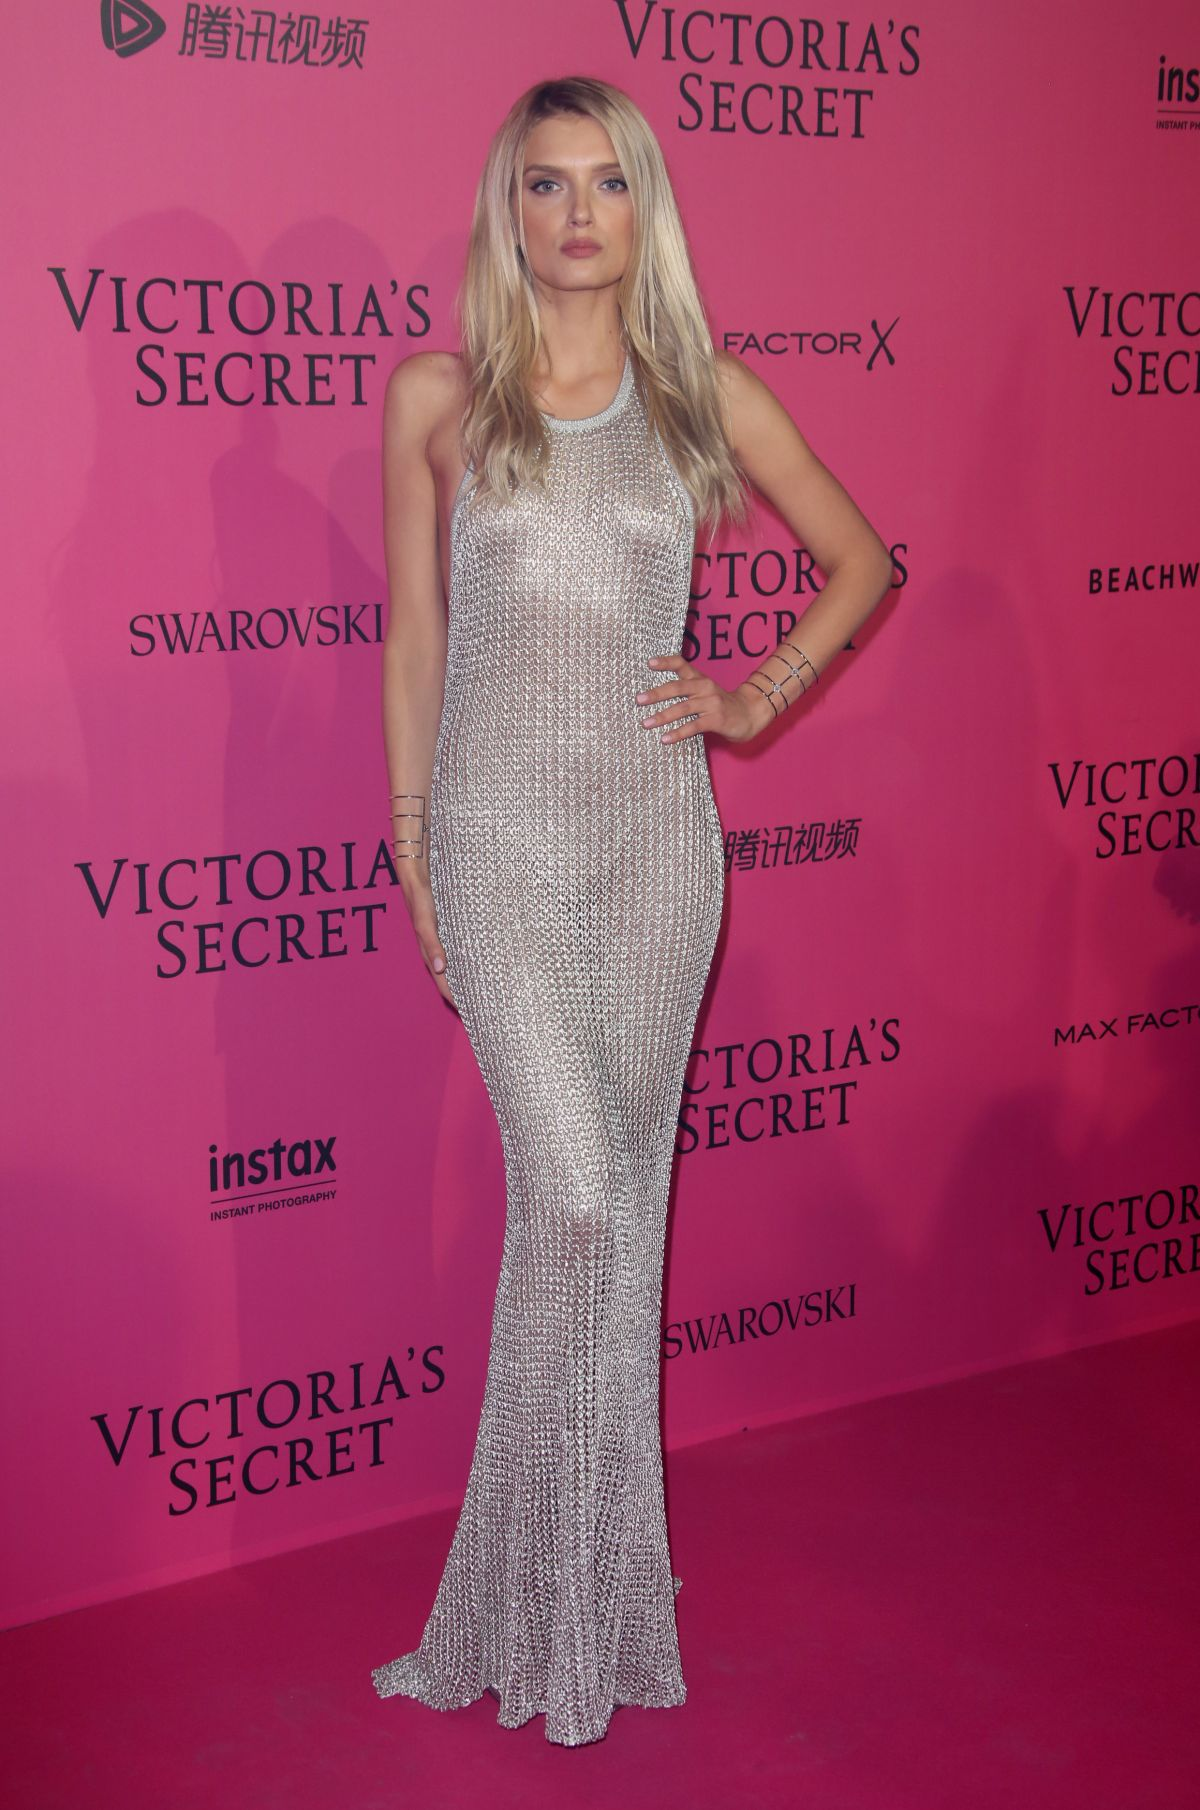 LILY DONALDSON at Victoria's Secret Fashion Show After Party in Paris 11/30/2016